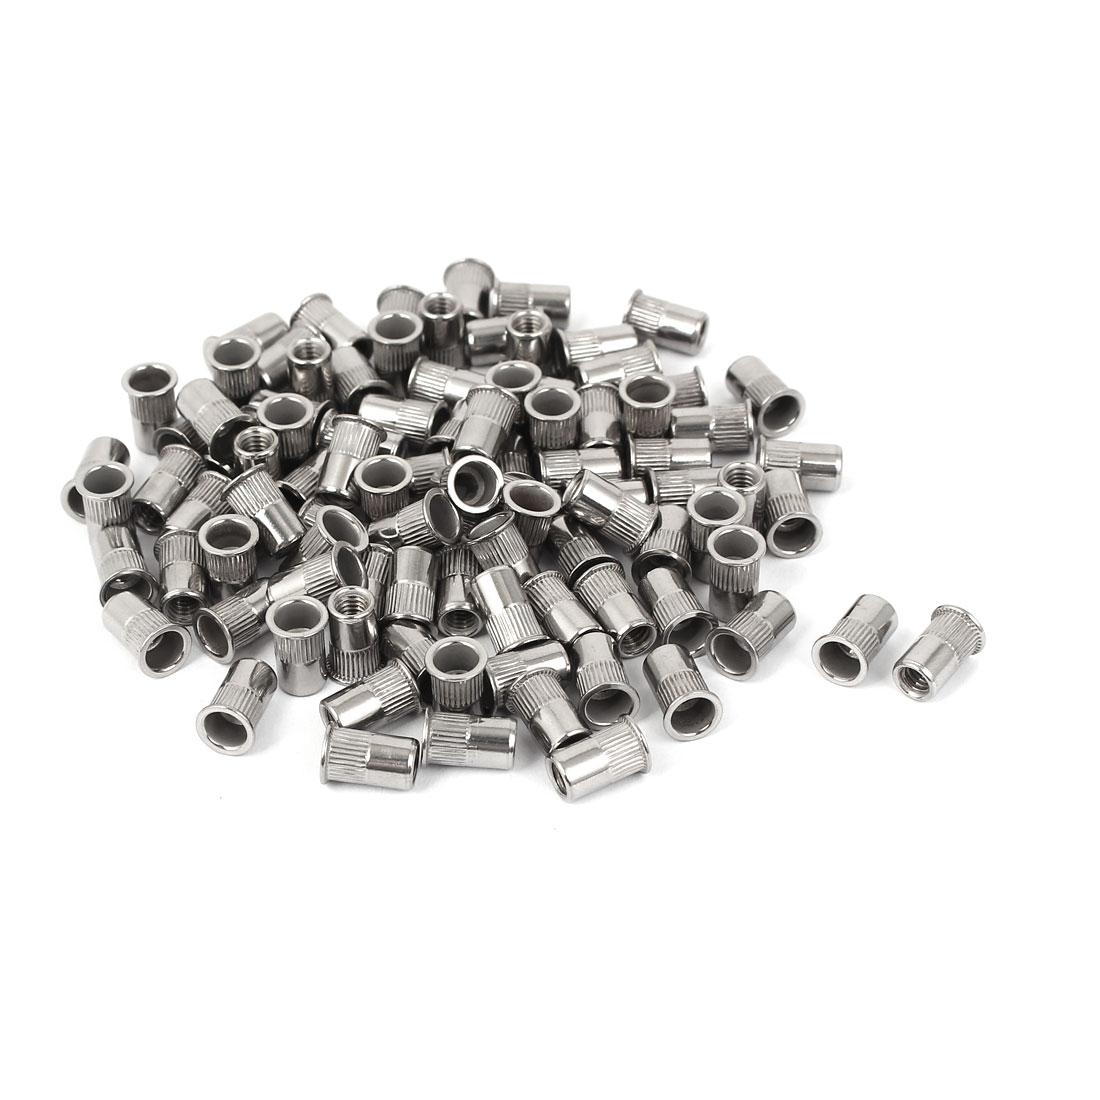 M4 304 Stainless Steel Rivet Nut Insert Nutsert Silver Tone 100pcs